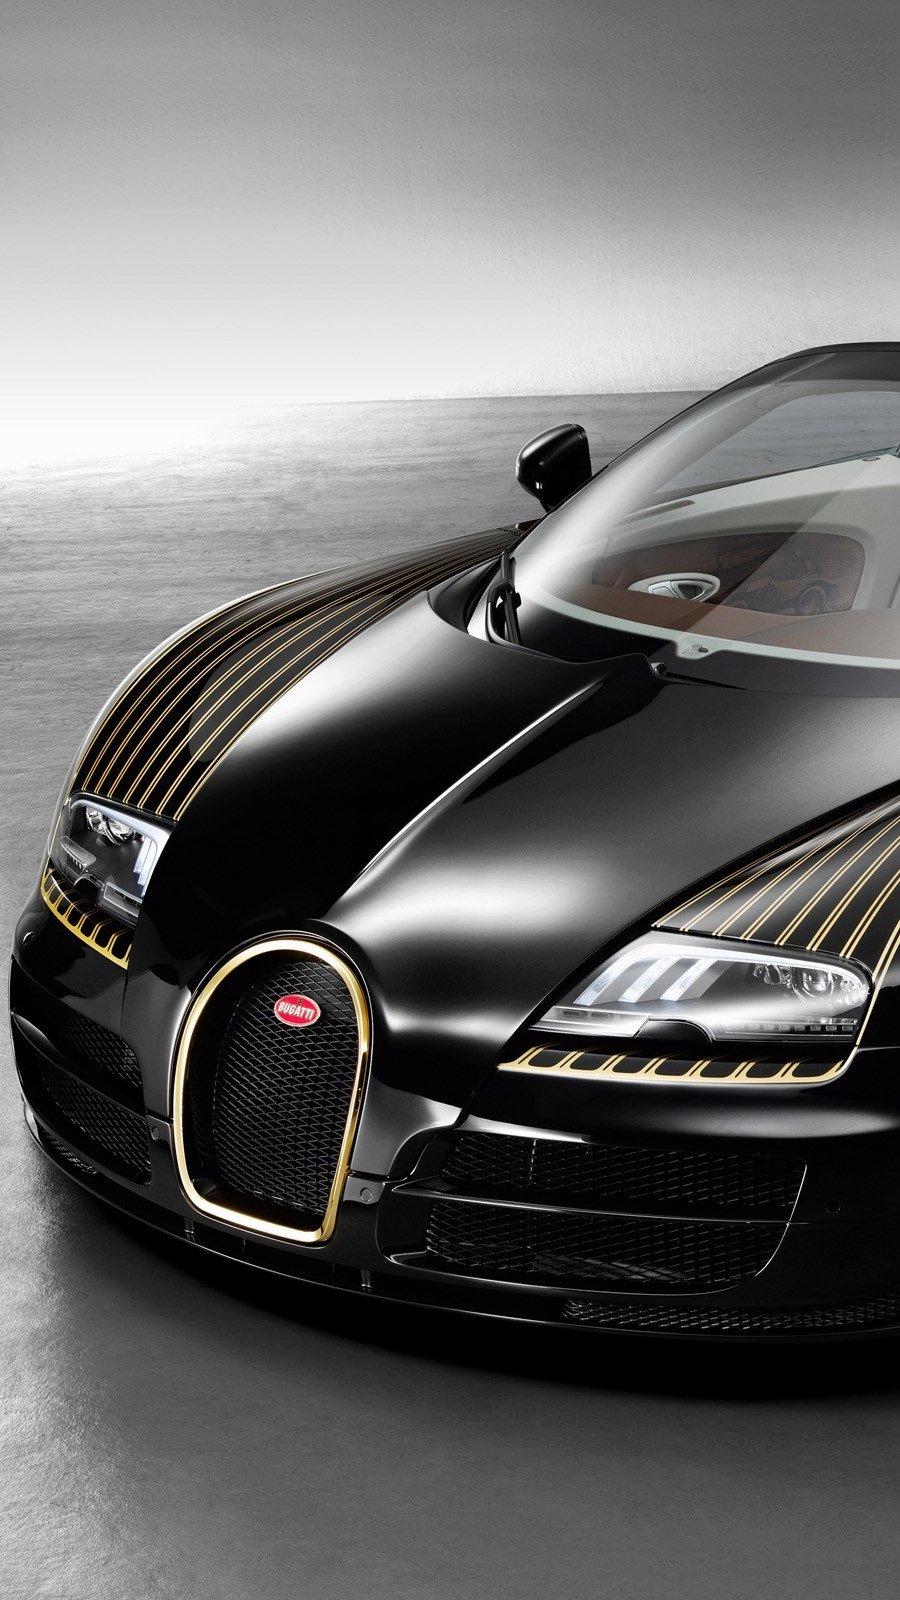 Fondos de pantalla Bugatti Veyron Grand Sport Vitesse ?Black Bess? Vertical